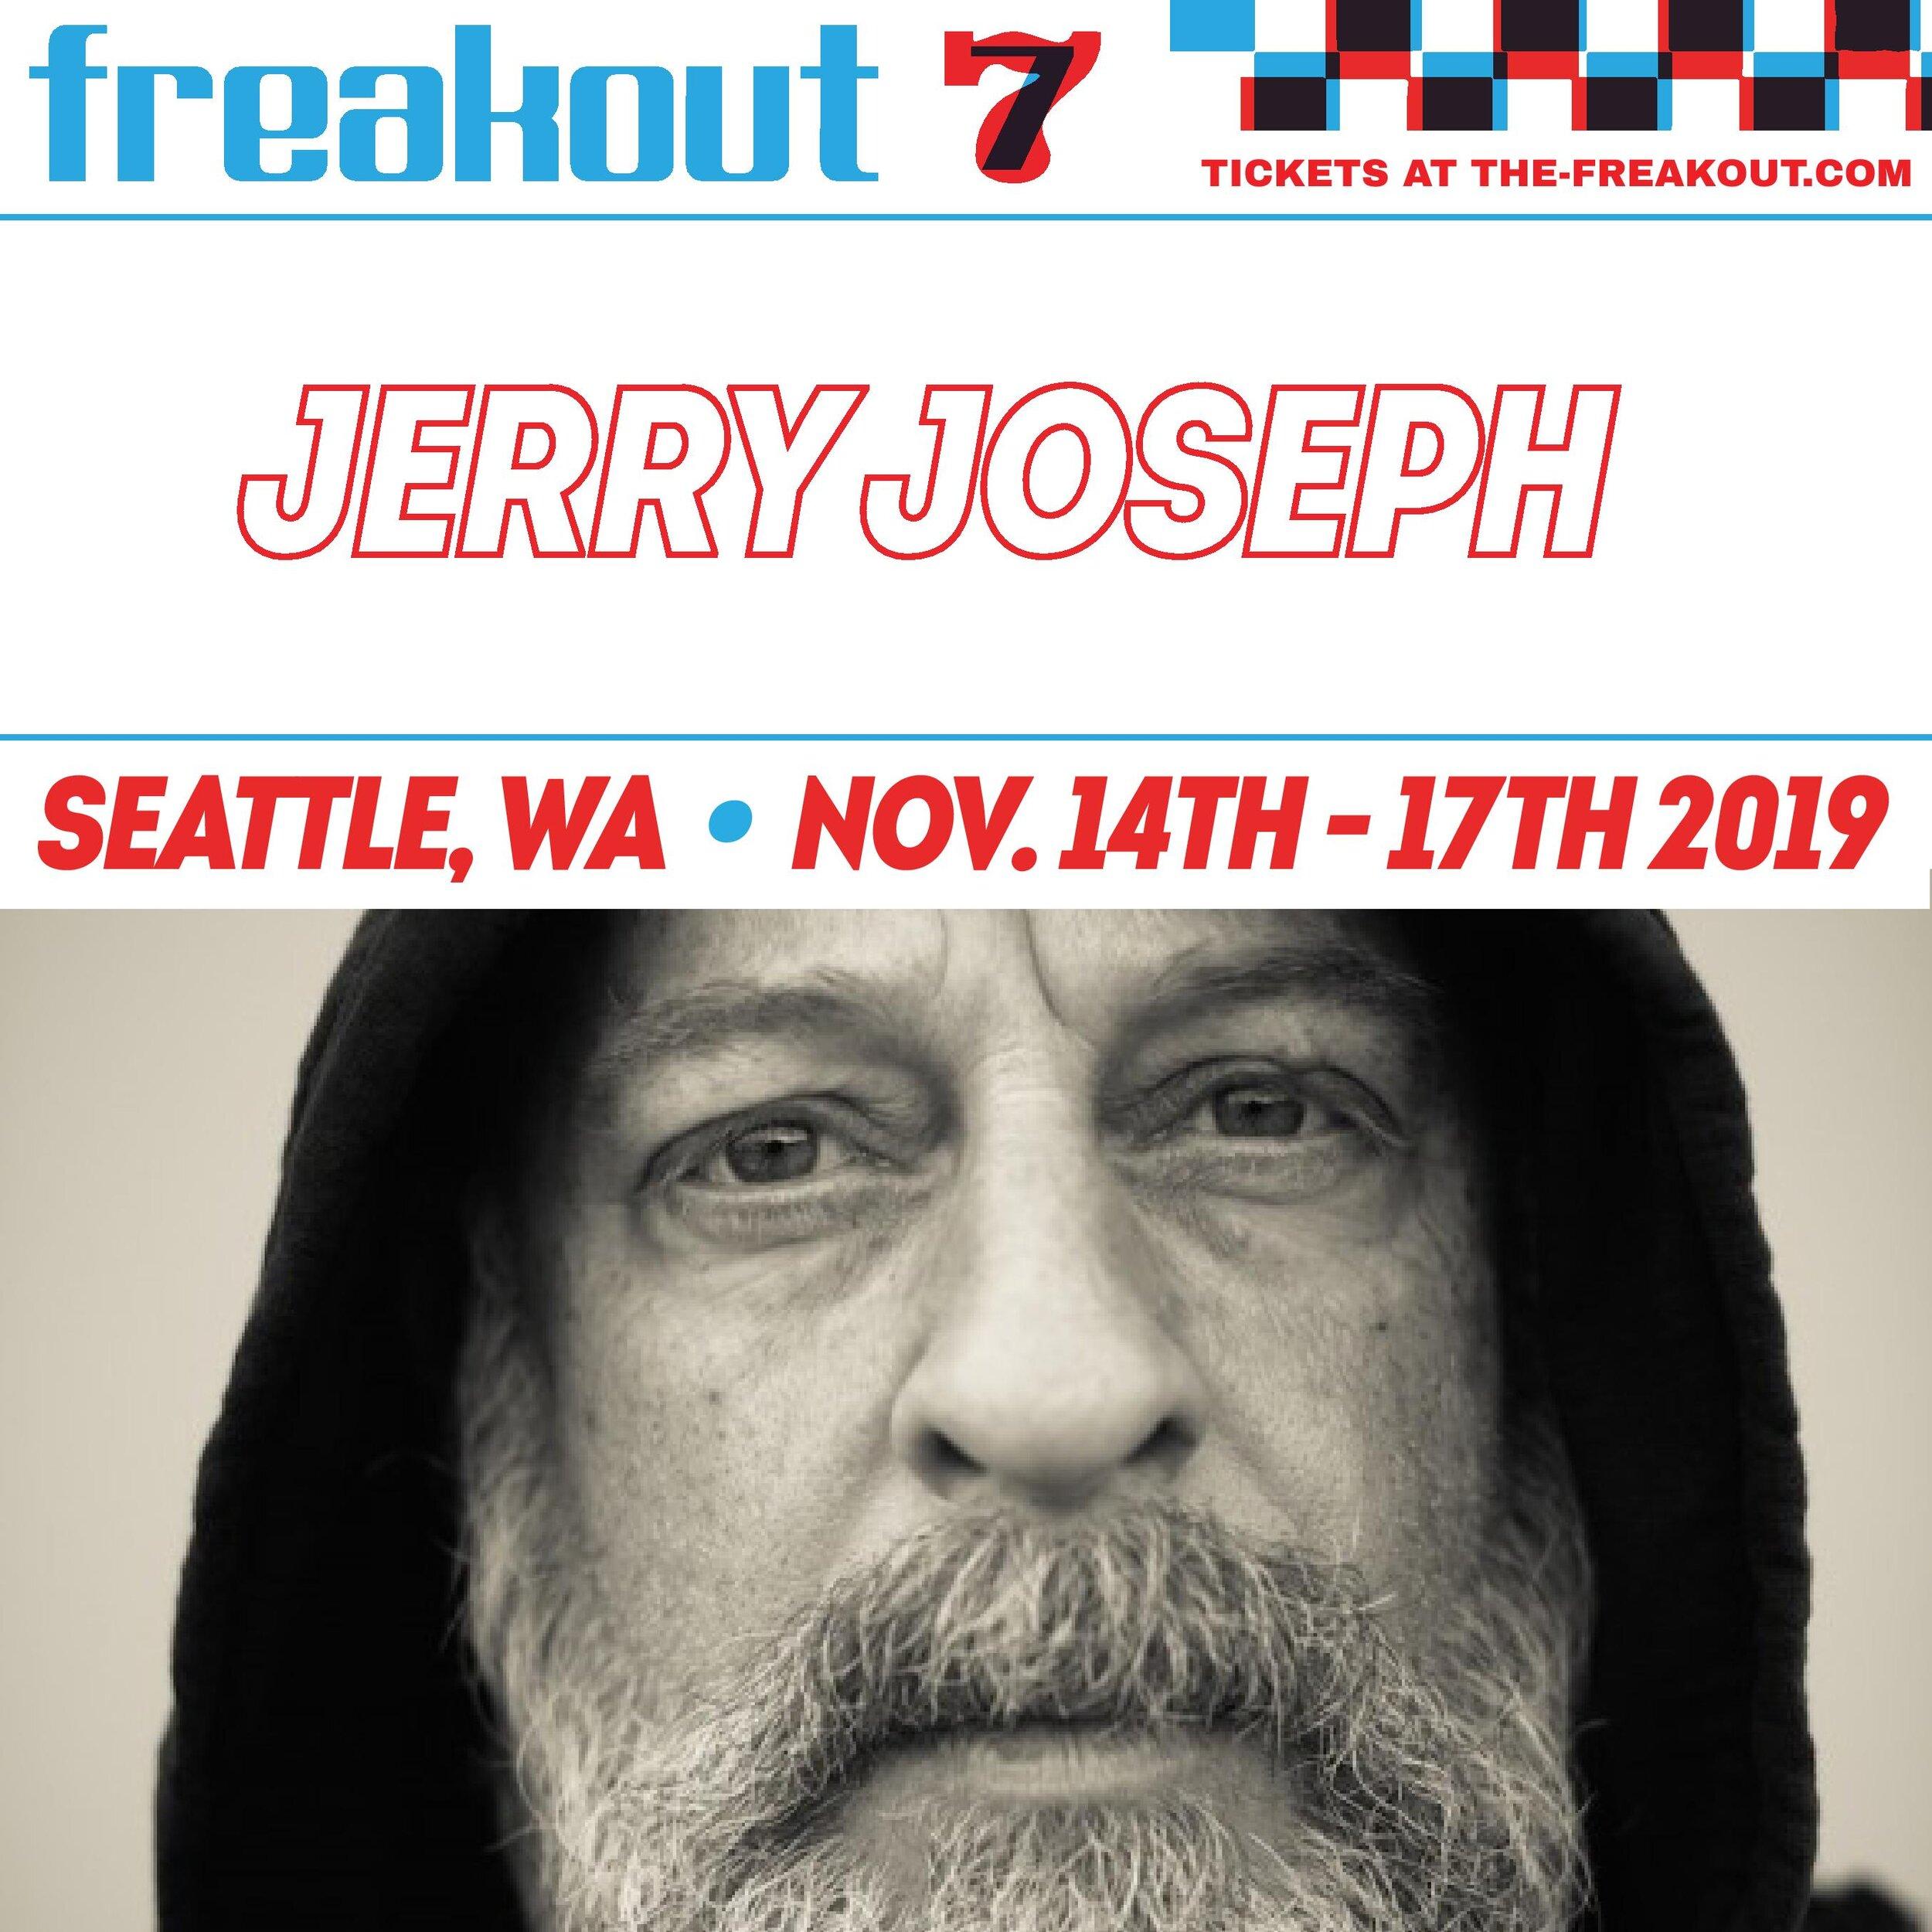 Jerry Joseph-page-001-2.jpg